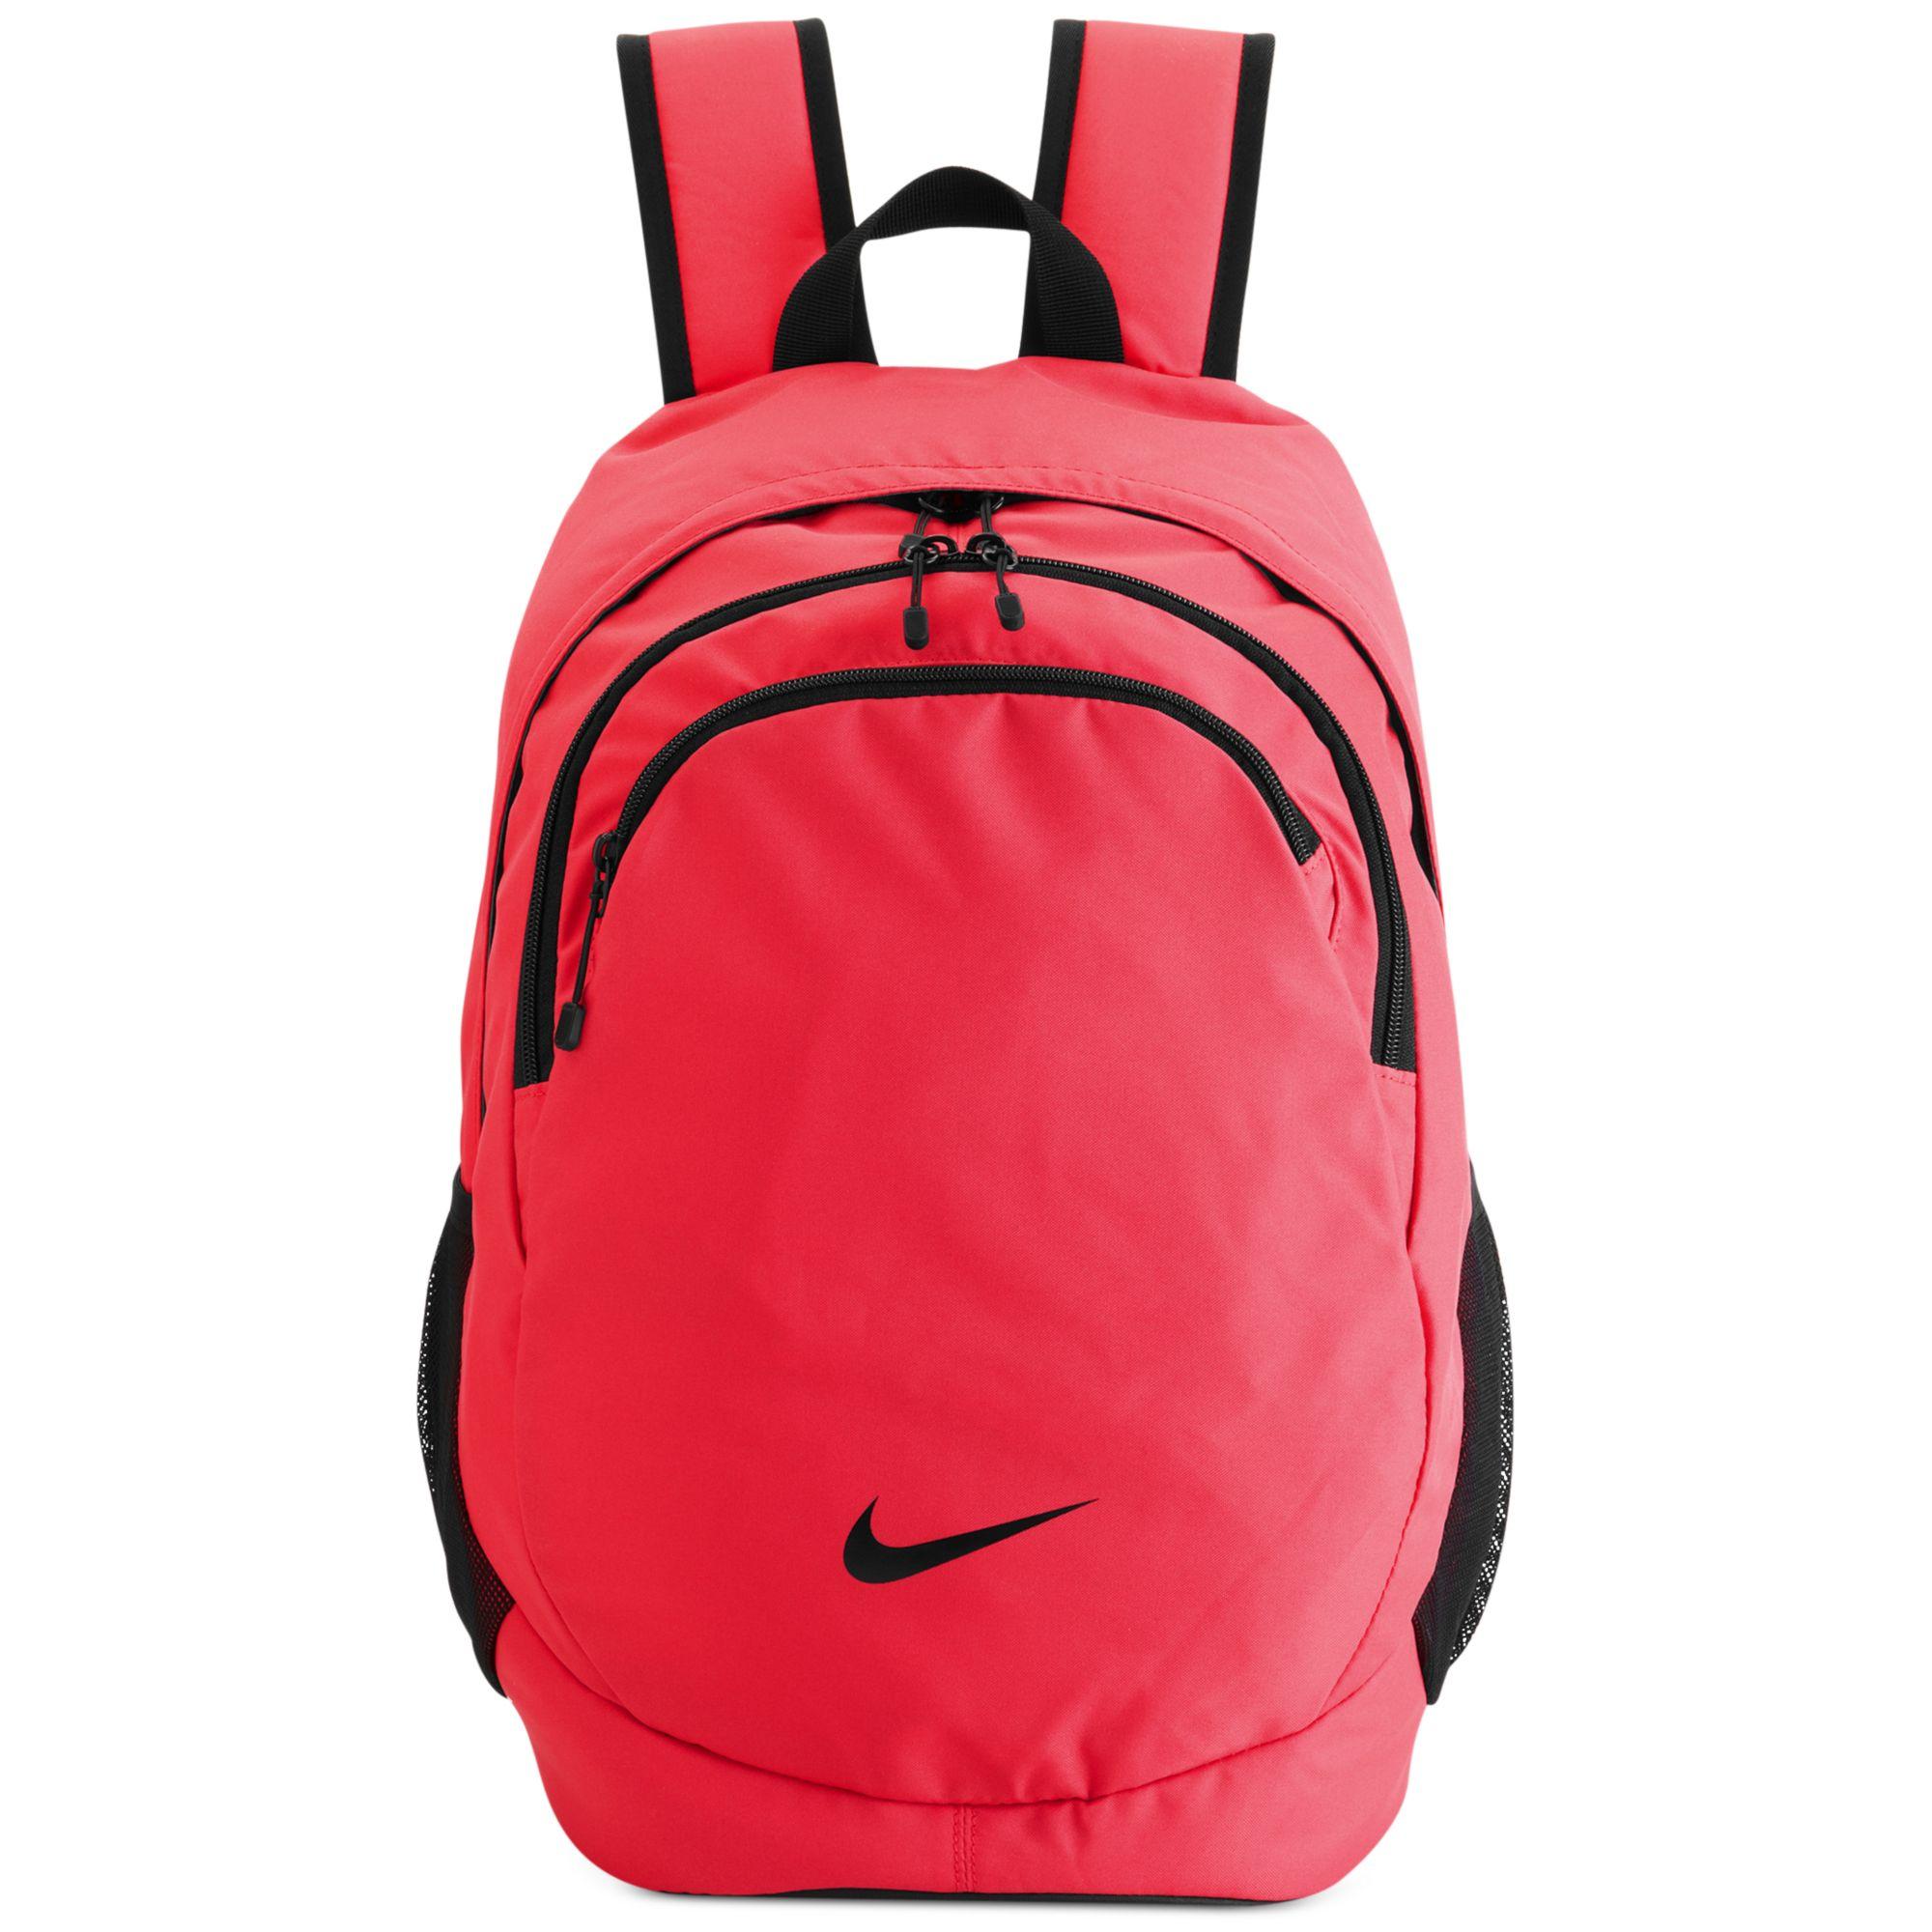 Lyst - Nike Team Training Backpack in Red 943a54baa9cf9